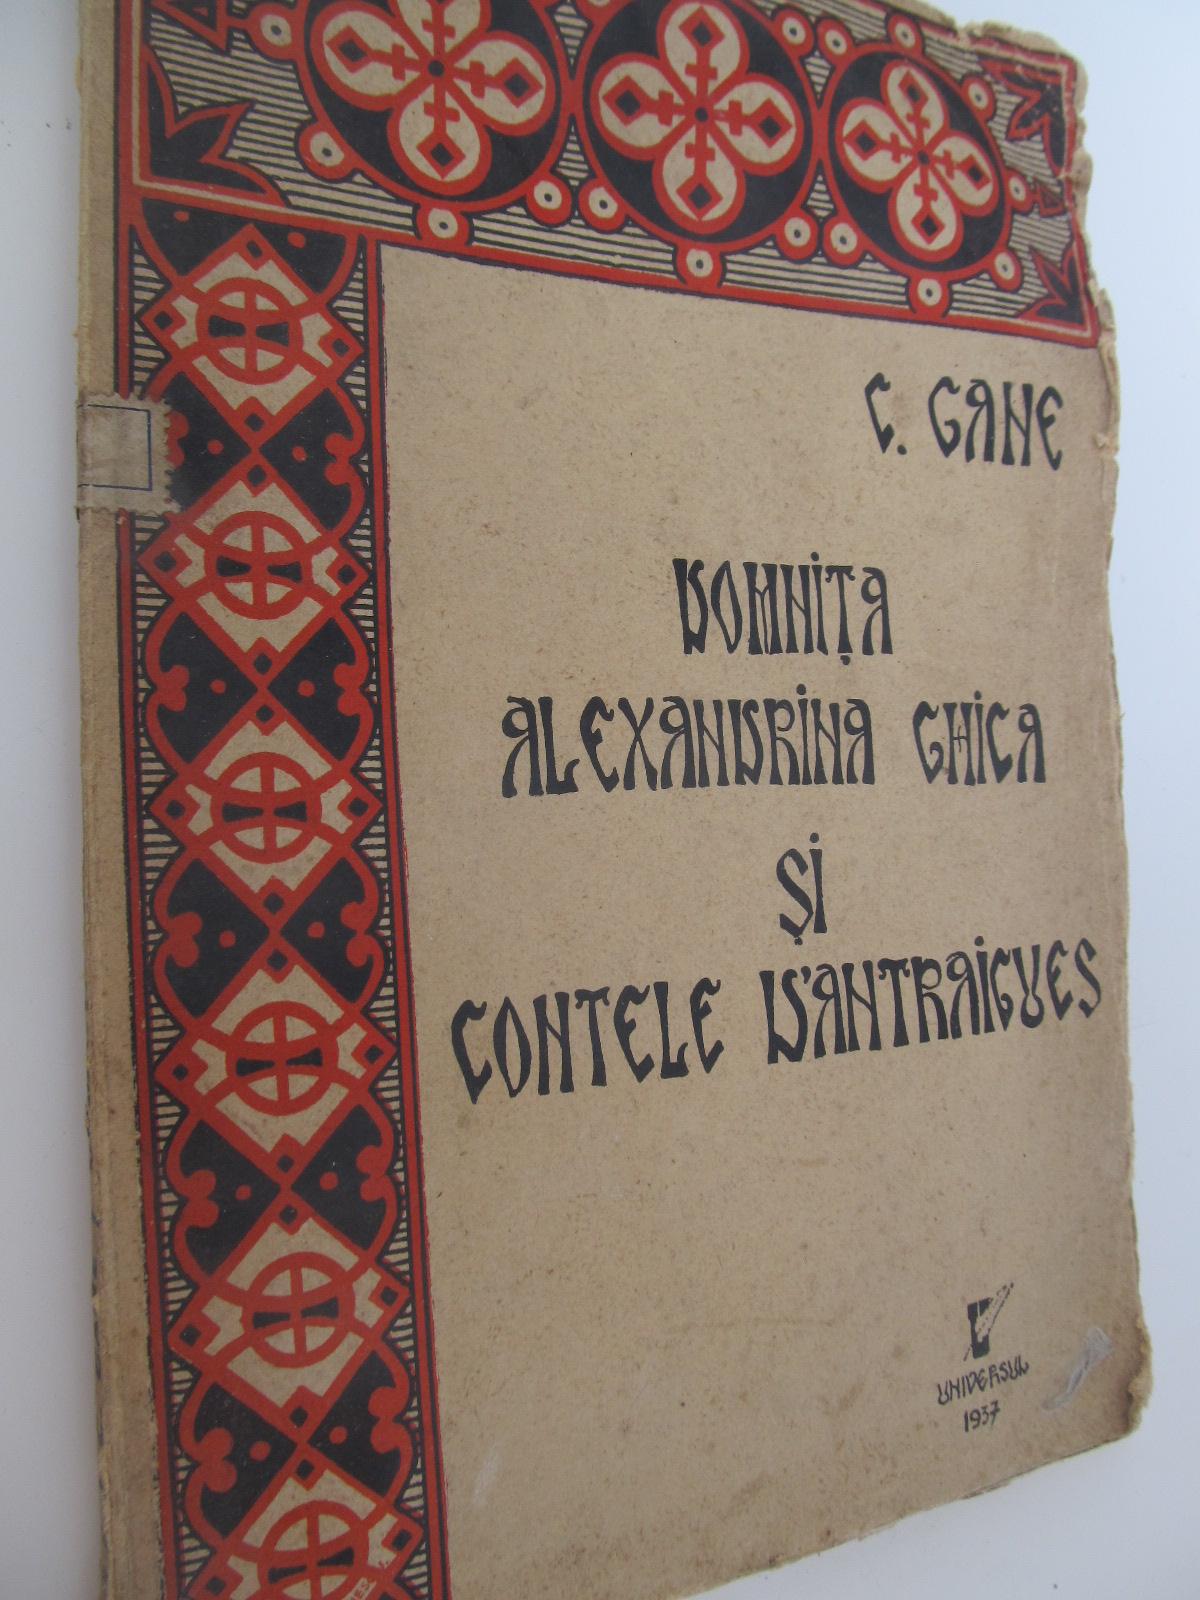 Domnita Alexandrina Ghica si contele D' Antraigues , 1937 - C. Gane | Detalii carte